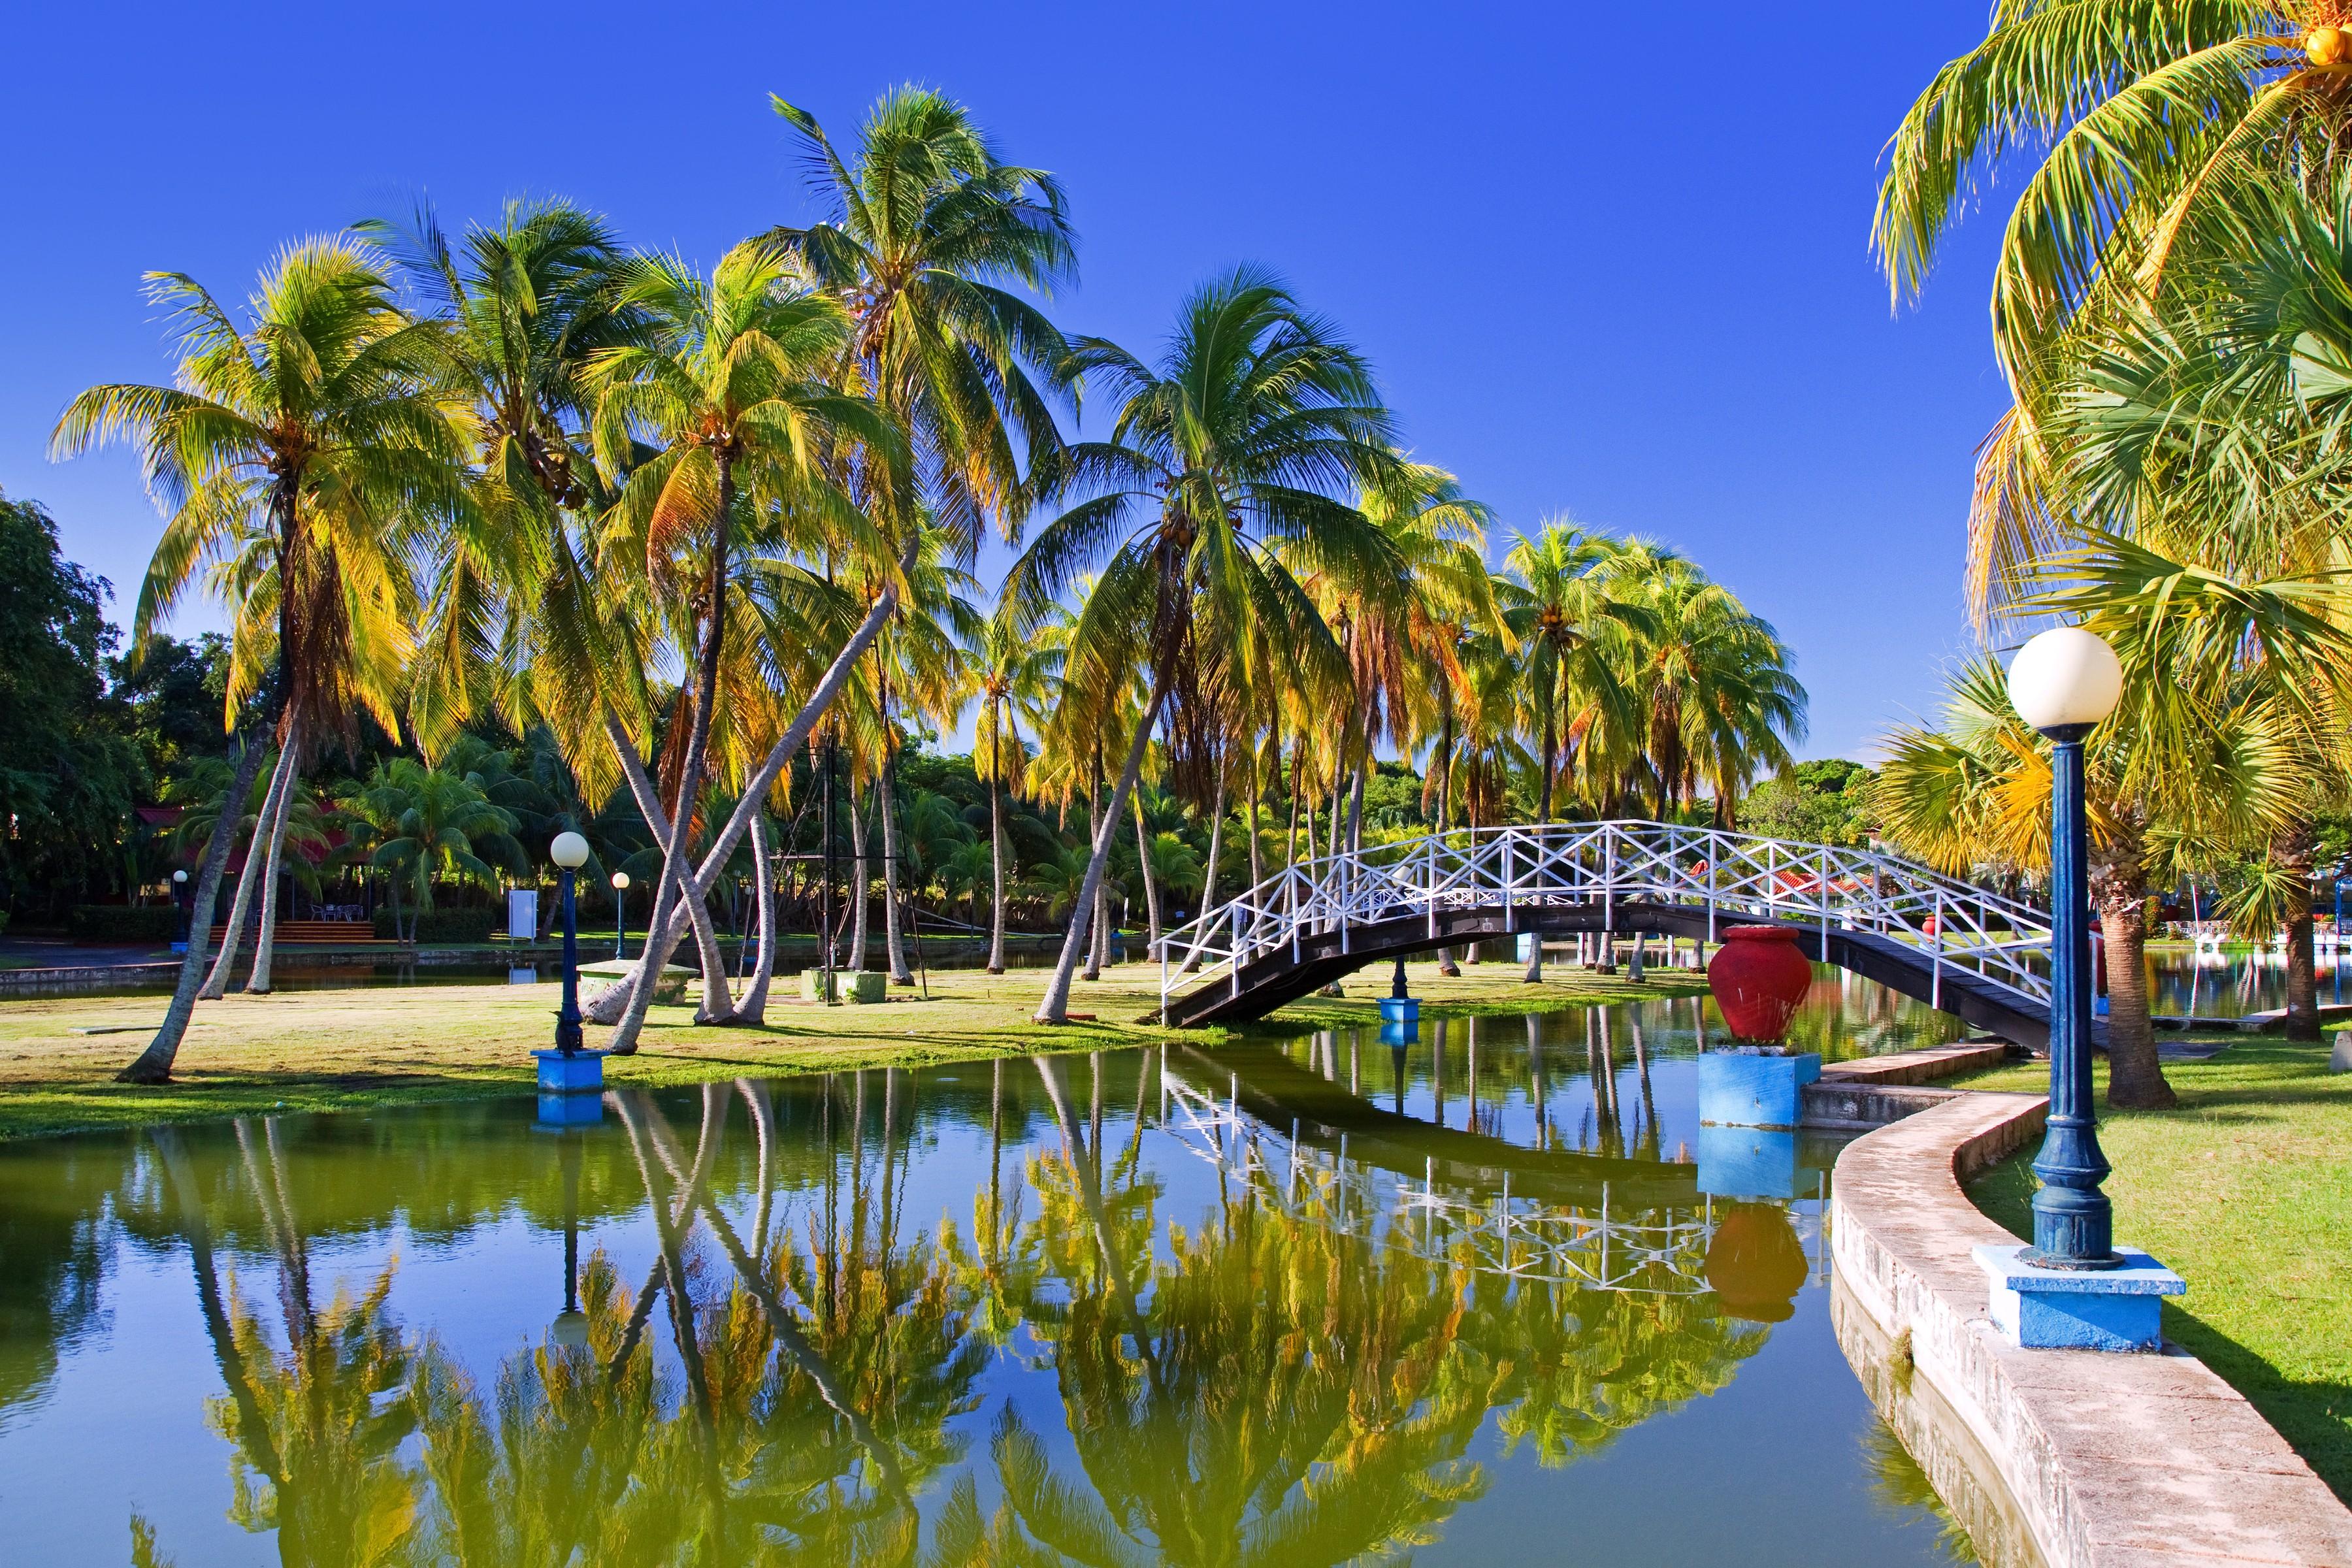 Josone Park - Varadero - Arrivalguides.com